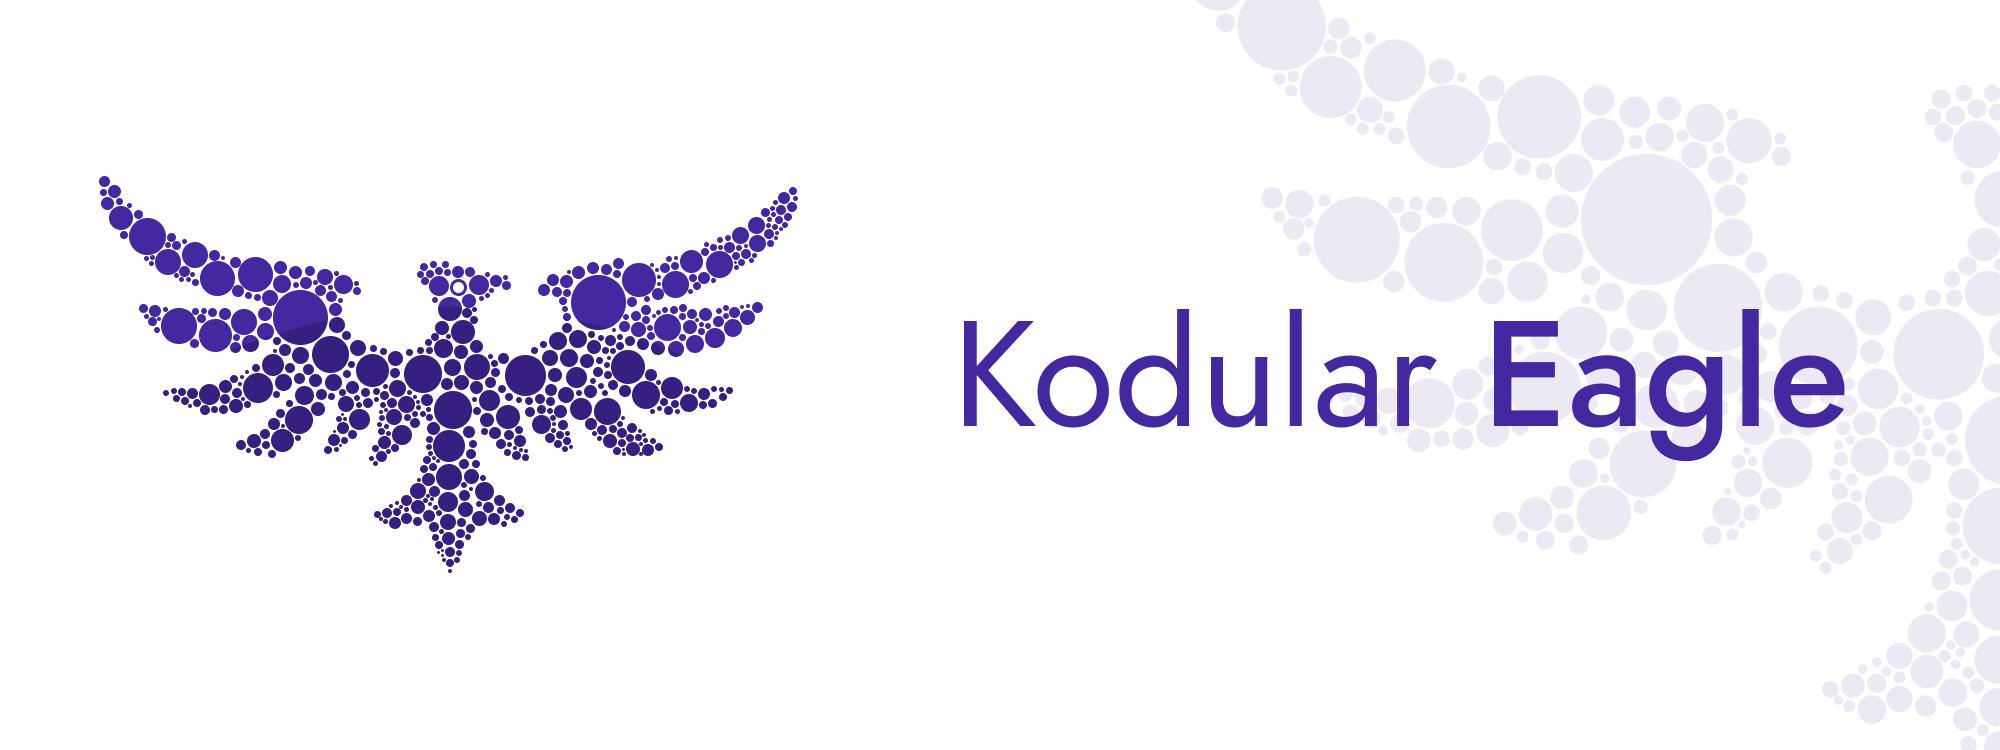 Kodular Eagle